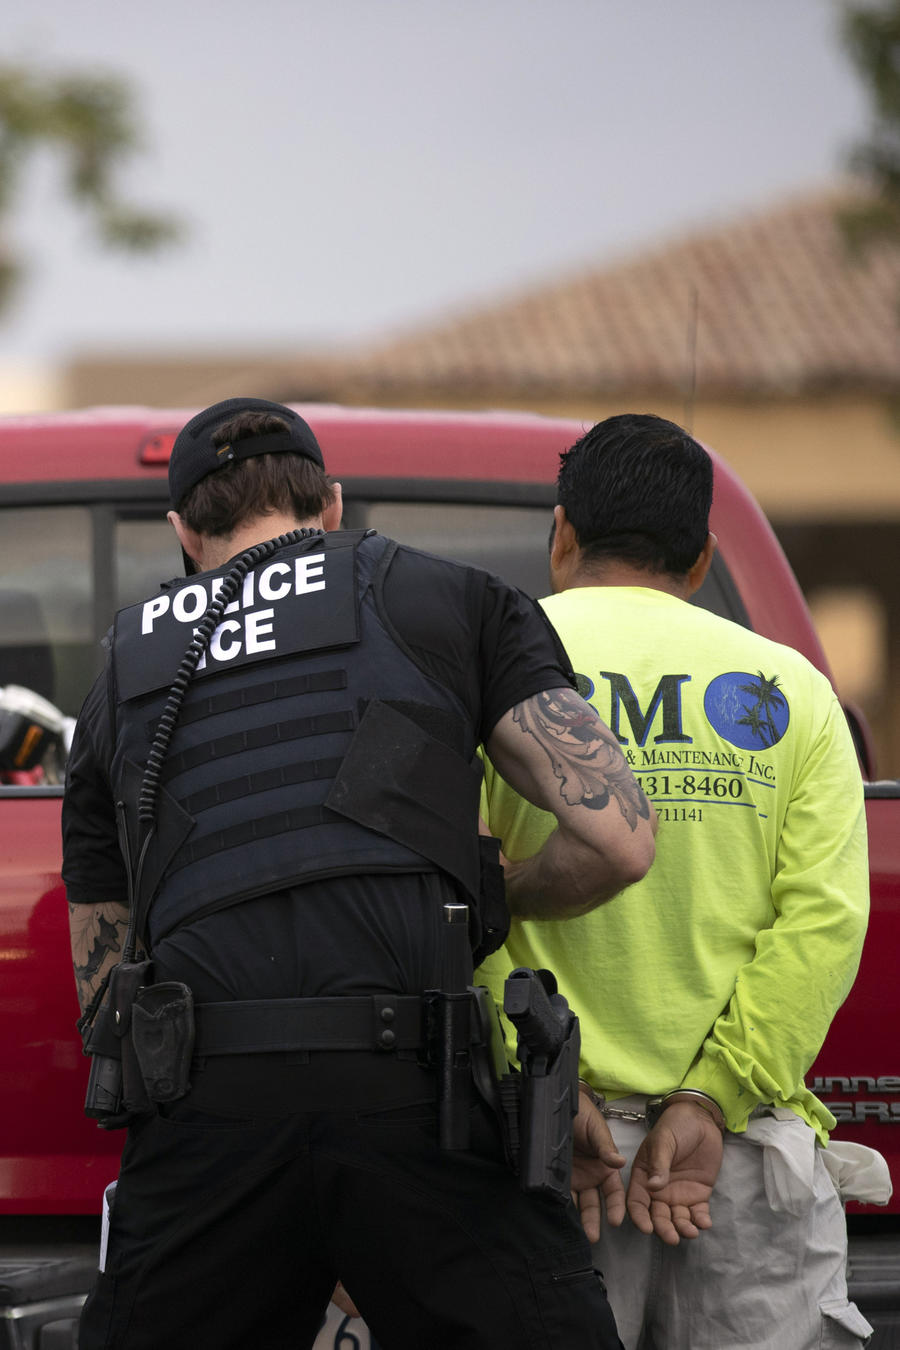 Deportación express